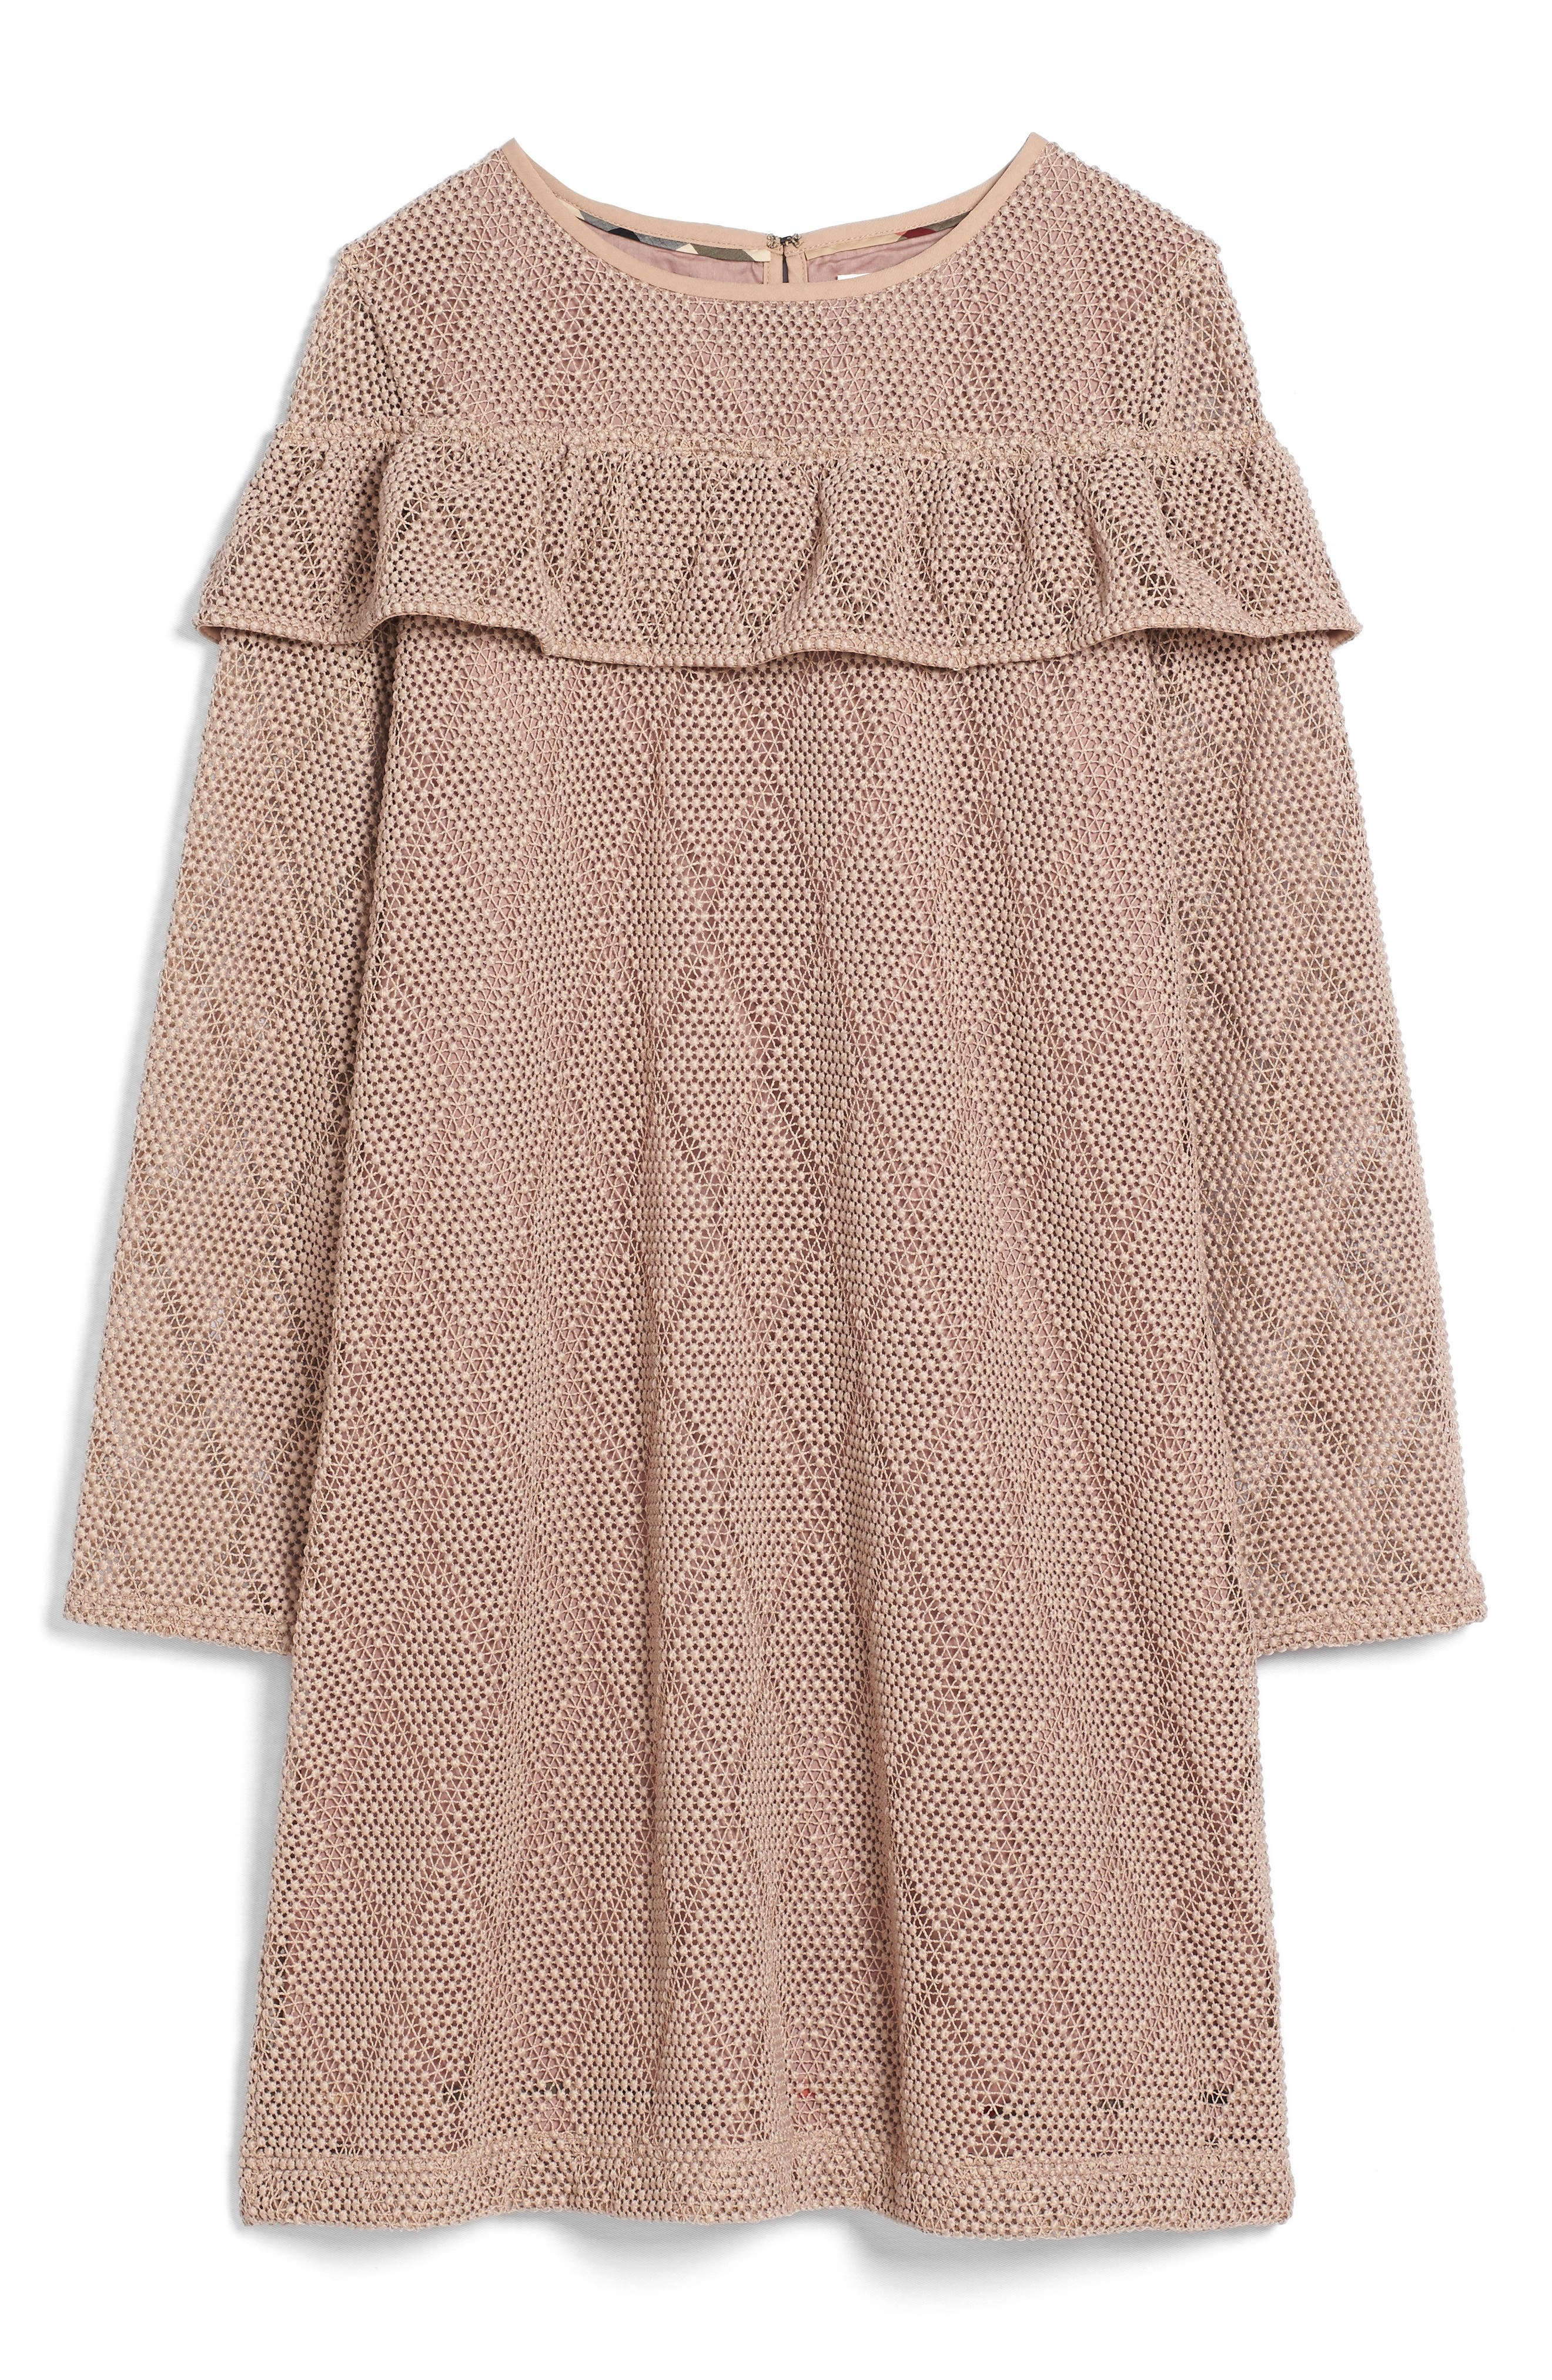 Burberry Sabrina Lace Dress (Little Girls & Big Girls)